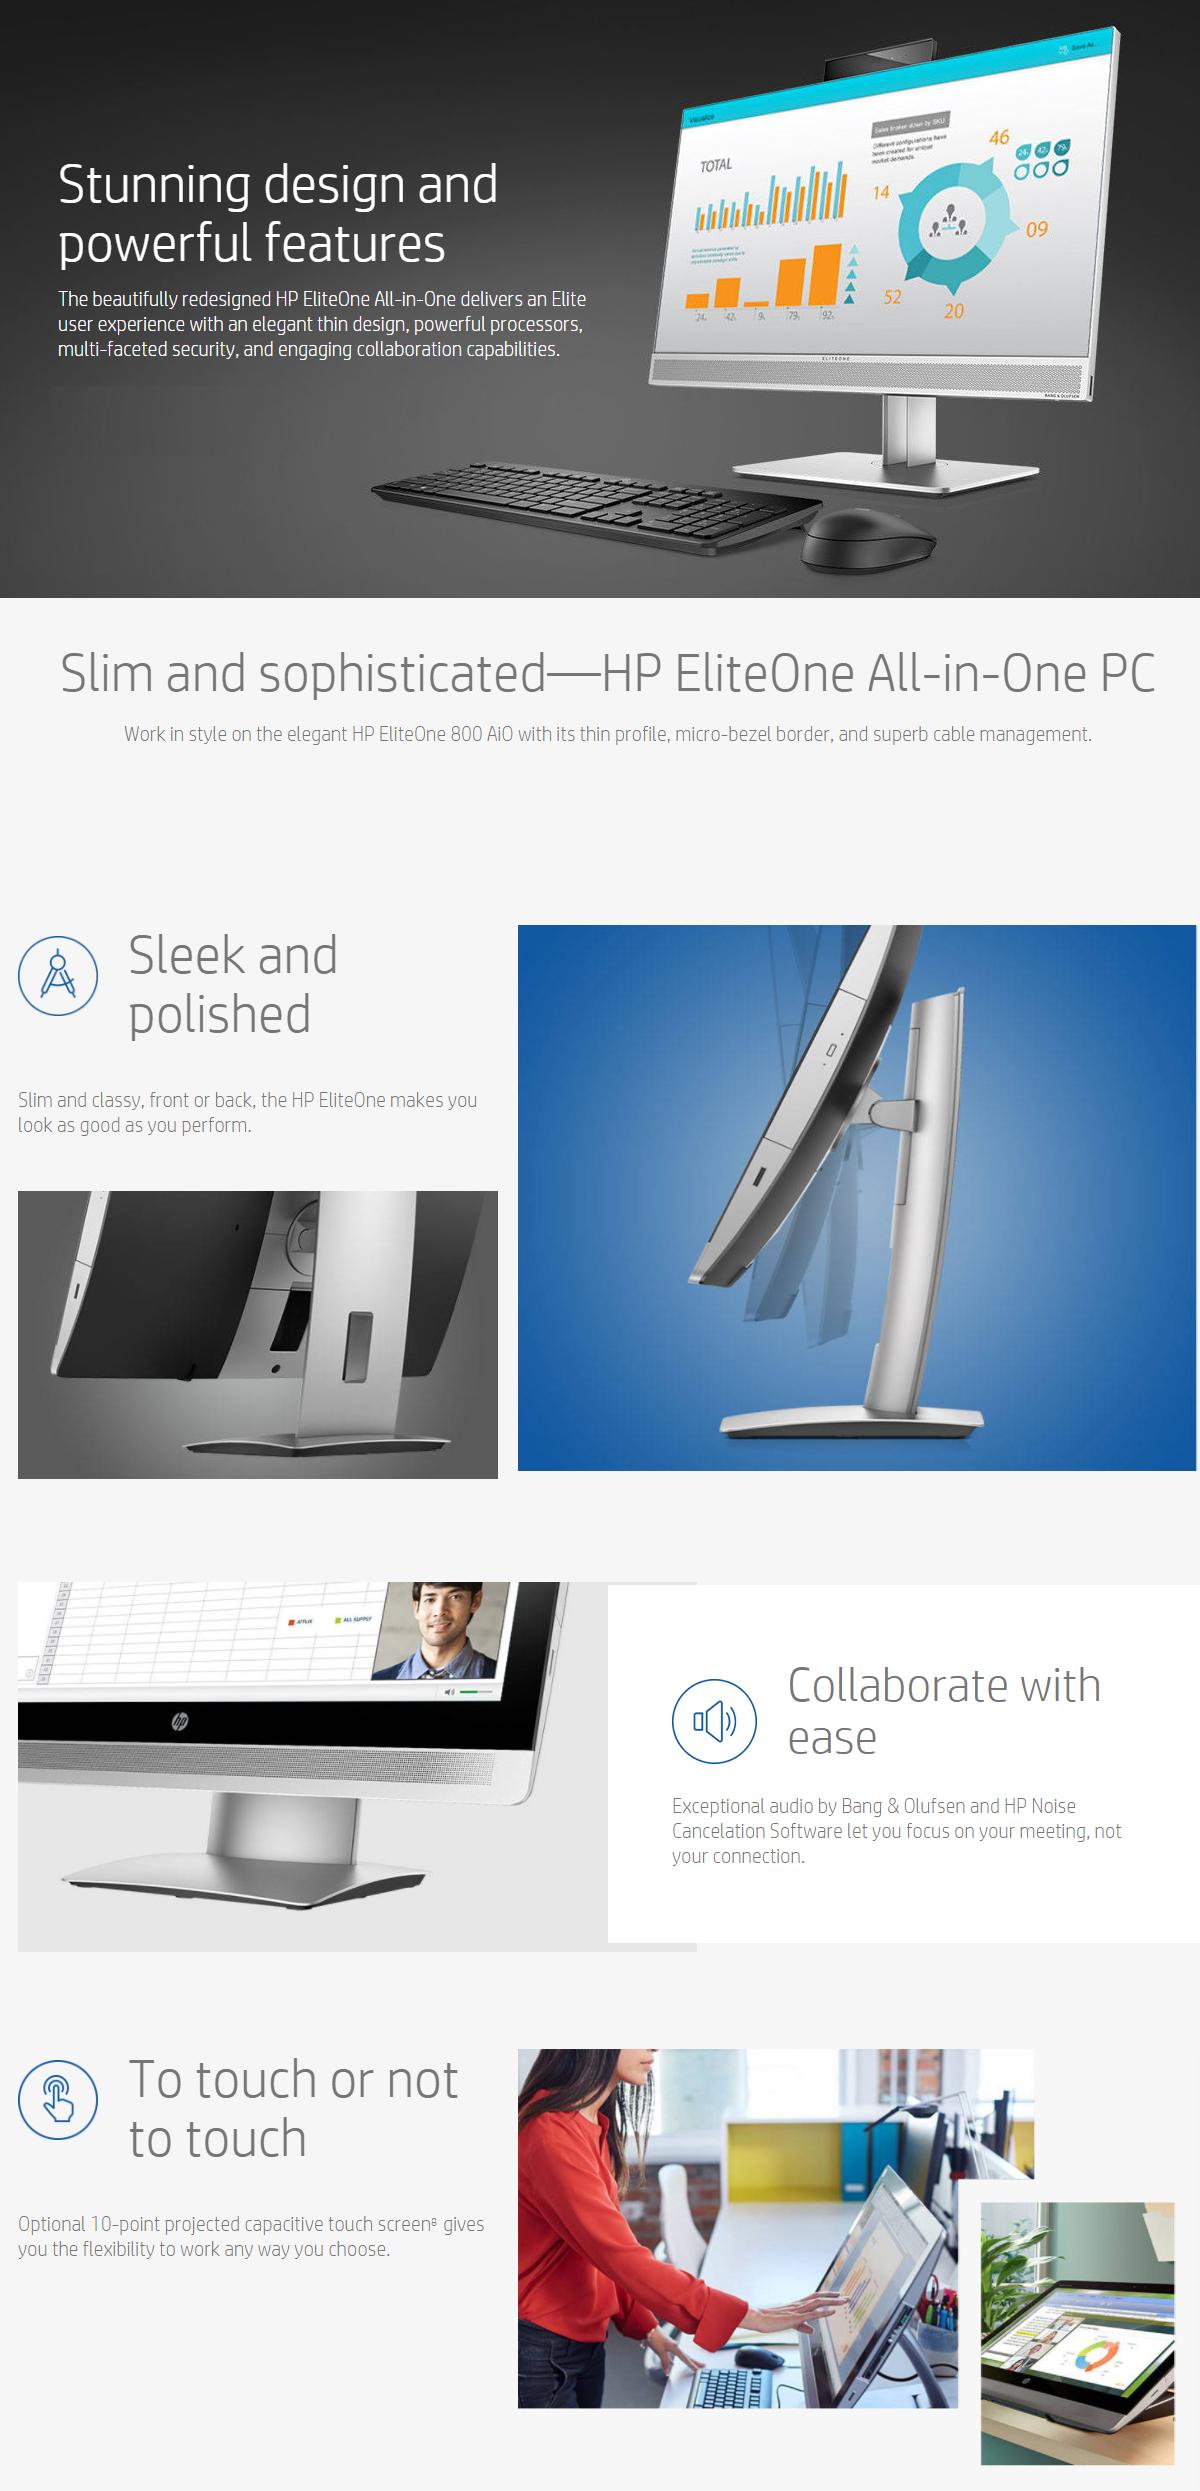 hp eliteone 800 g3 i5 23 8 aio desktop pc fhd tou 1mf48pa shopping express online. Black Bedroom Furniture Sets. Home Design Ideas